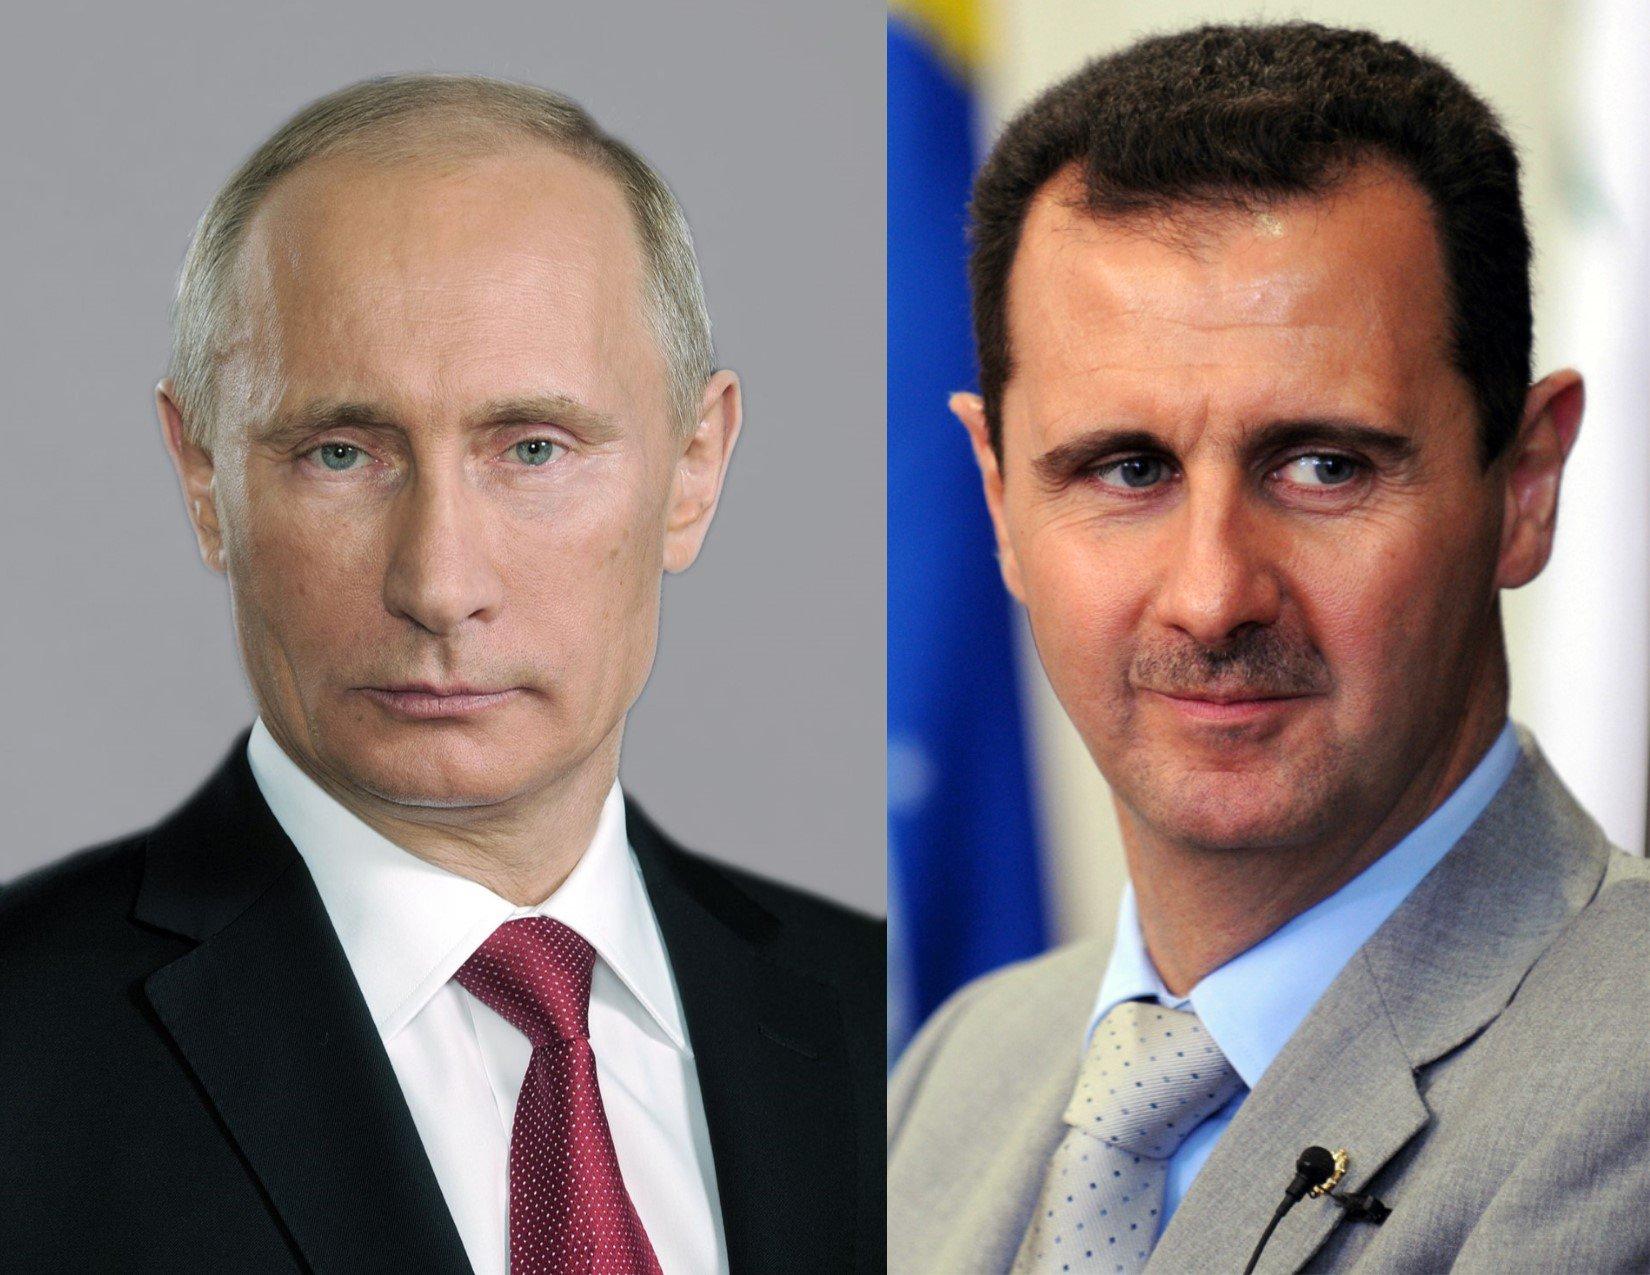 El presidente sirio, Bashar Al Assad (izquierda) y su homólogo ruso, Vladimir Putin.